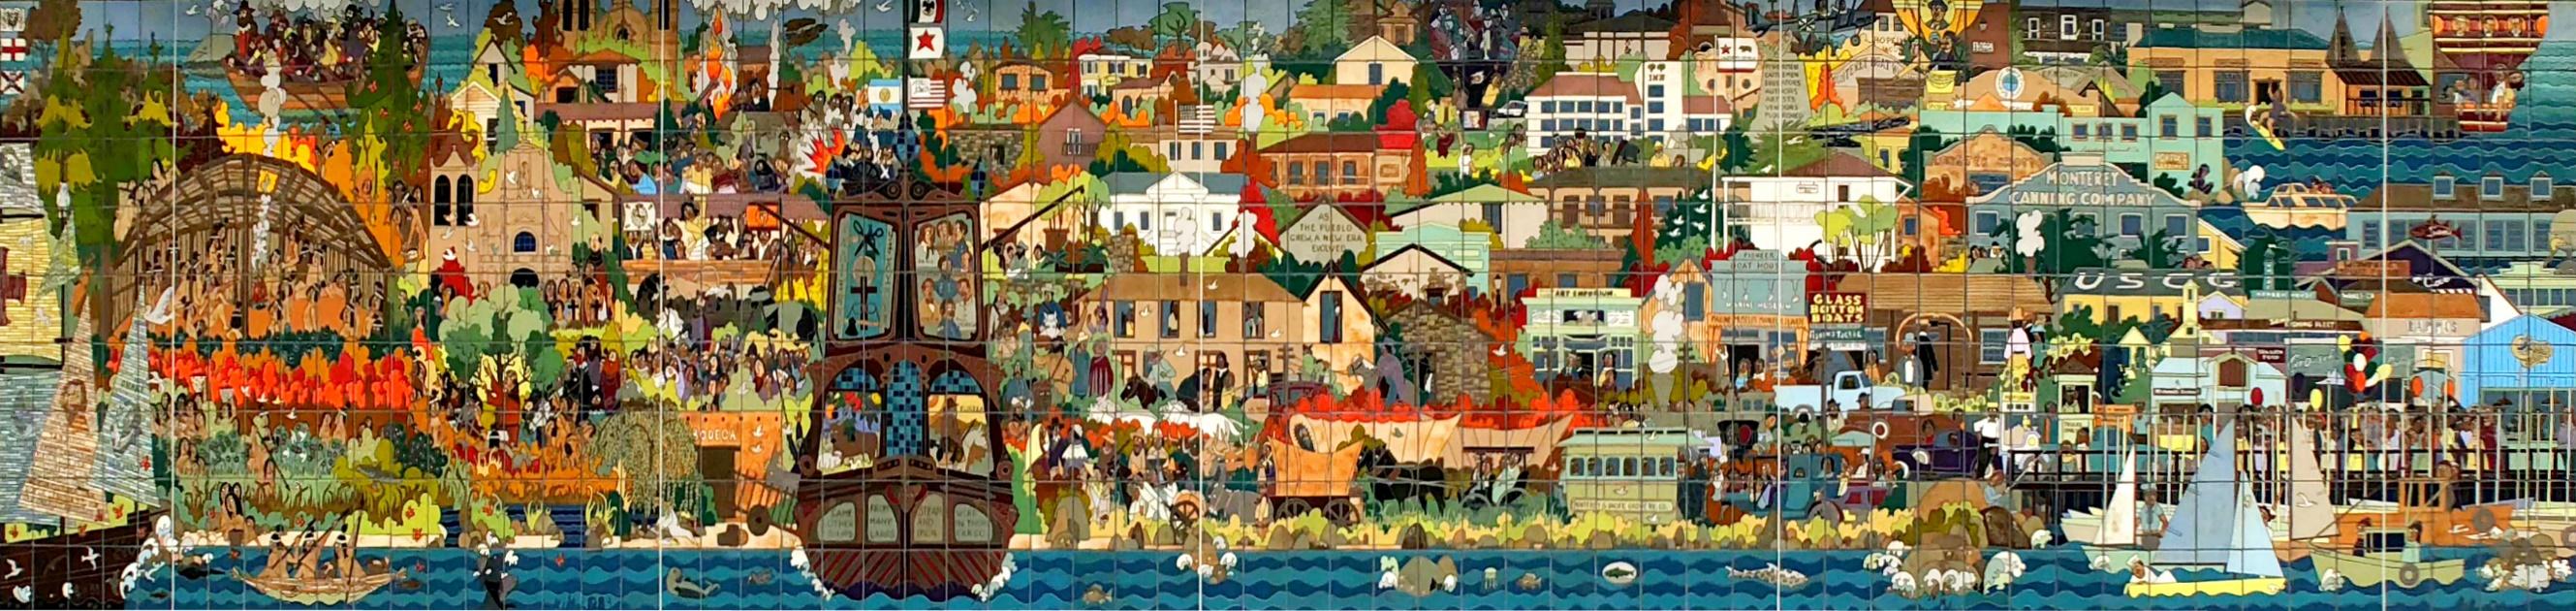 The Monterey Mural, Guillermo Wagner Granizo 1983, Monterey, California